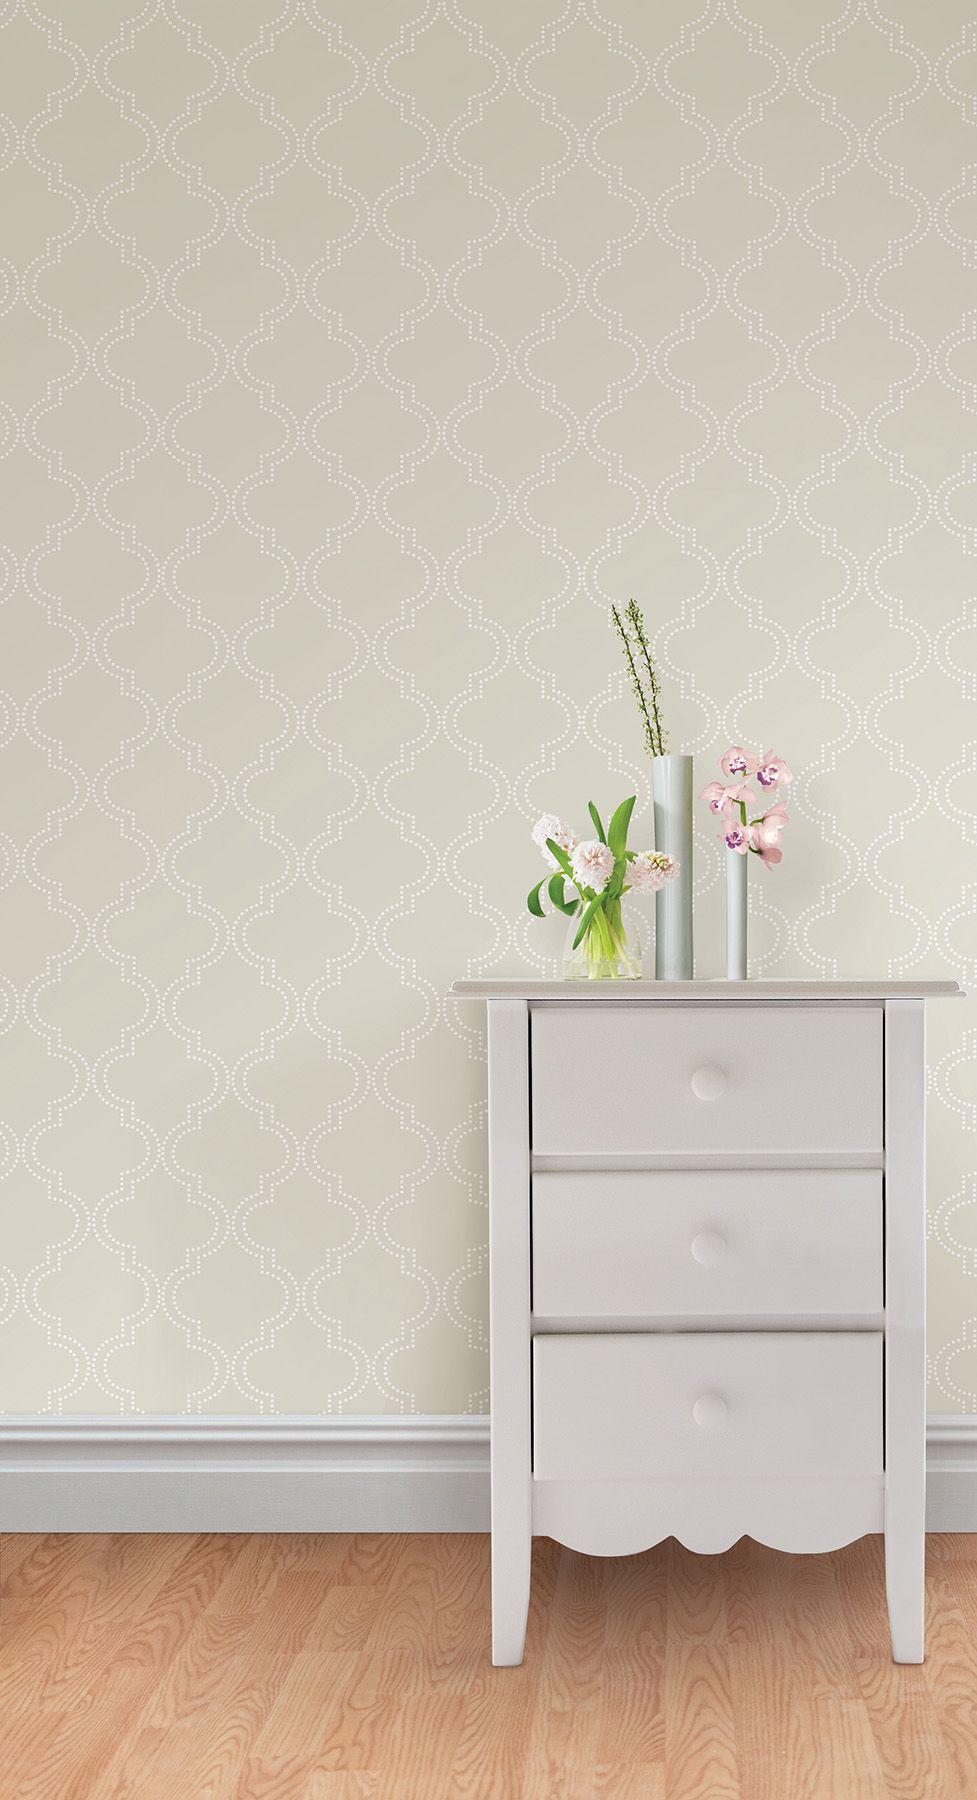 Taupe Quafoil Wallpaper By Nuwallpaper Wallpaper House Design Peel And Stick Wallpaper Trellis Wallpaper